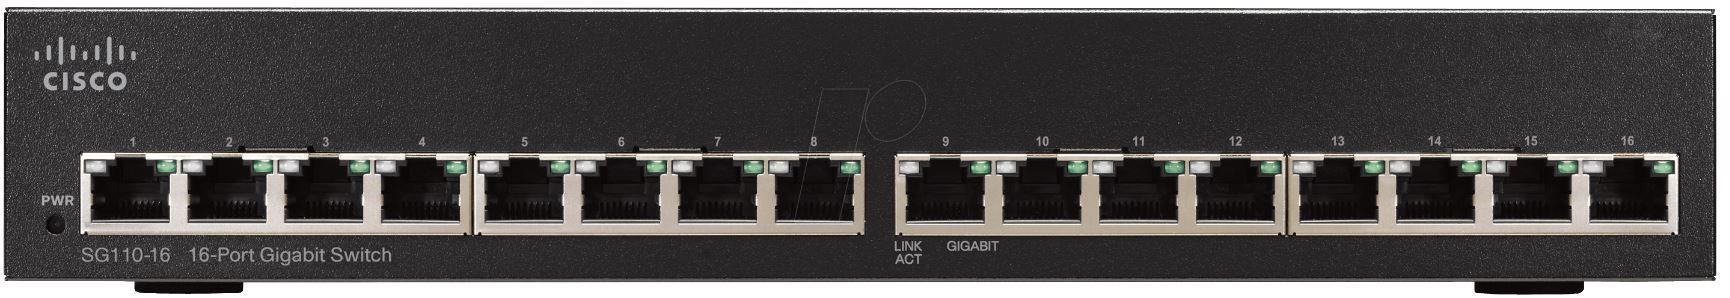 CISCO 16-Port Gigabit Unmanaged Switch